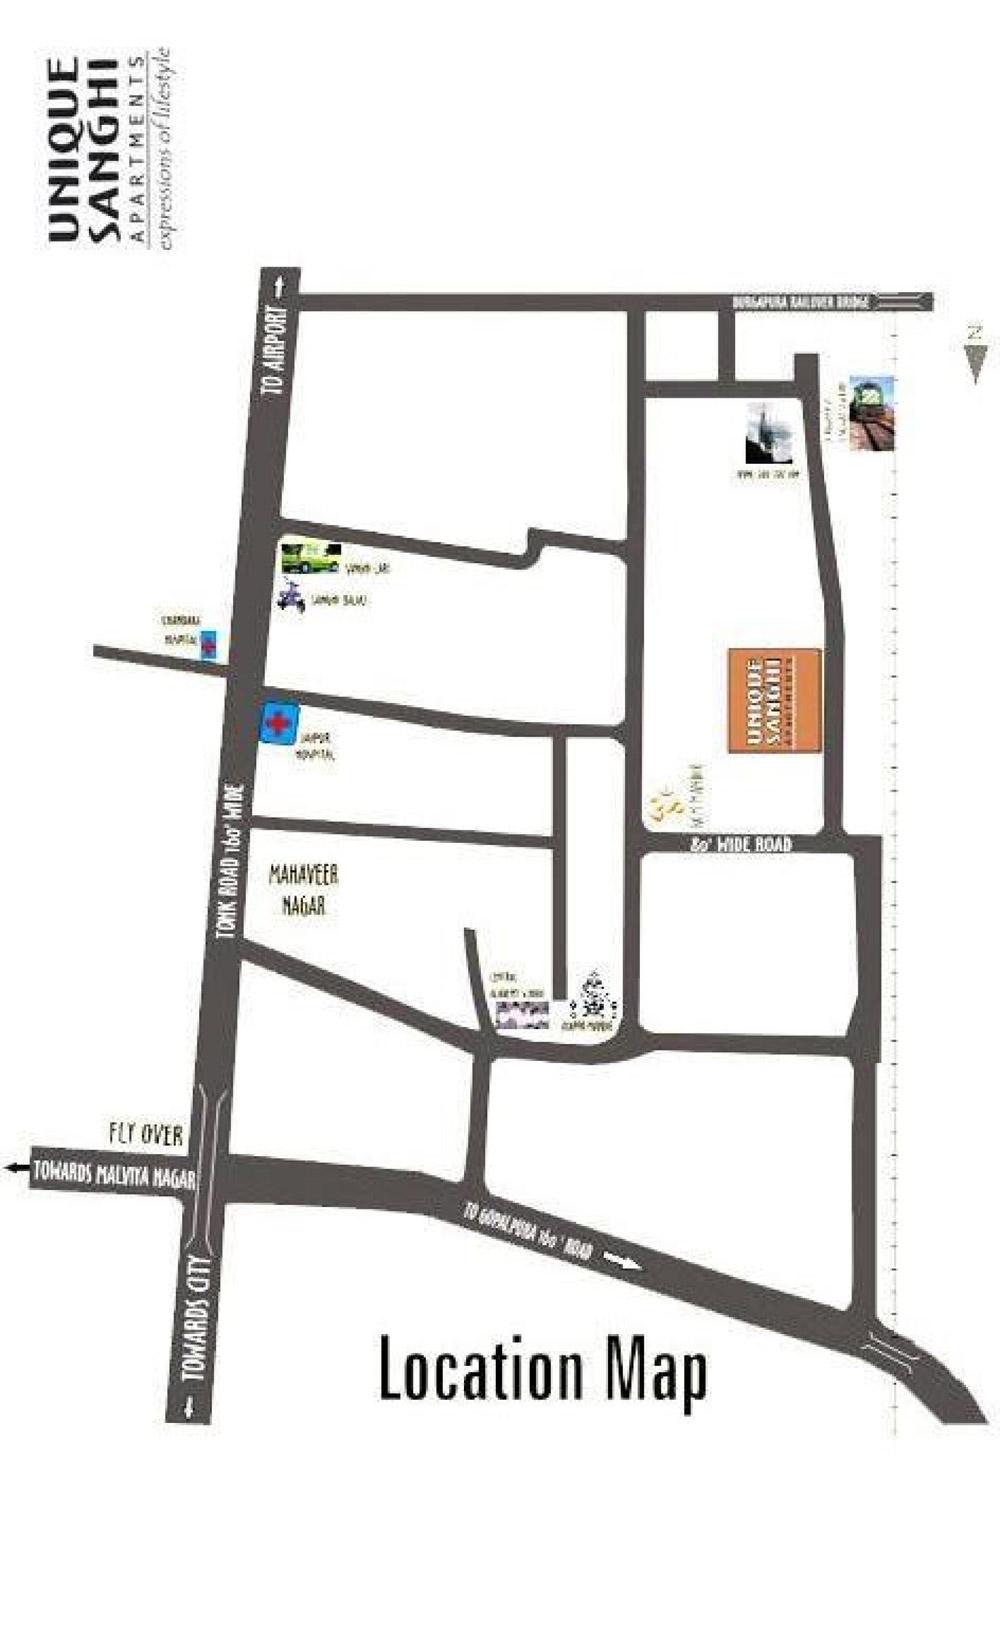 Unique Sanghi Apartments - Location Map